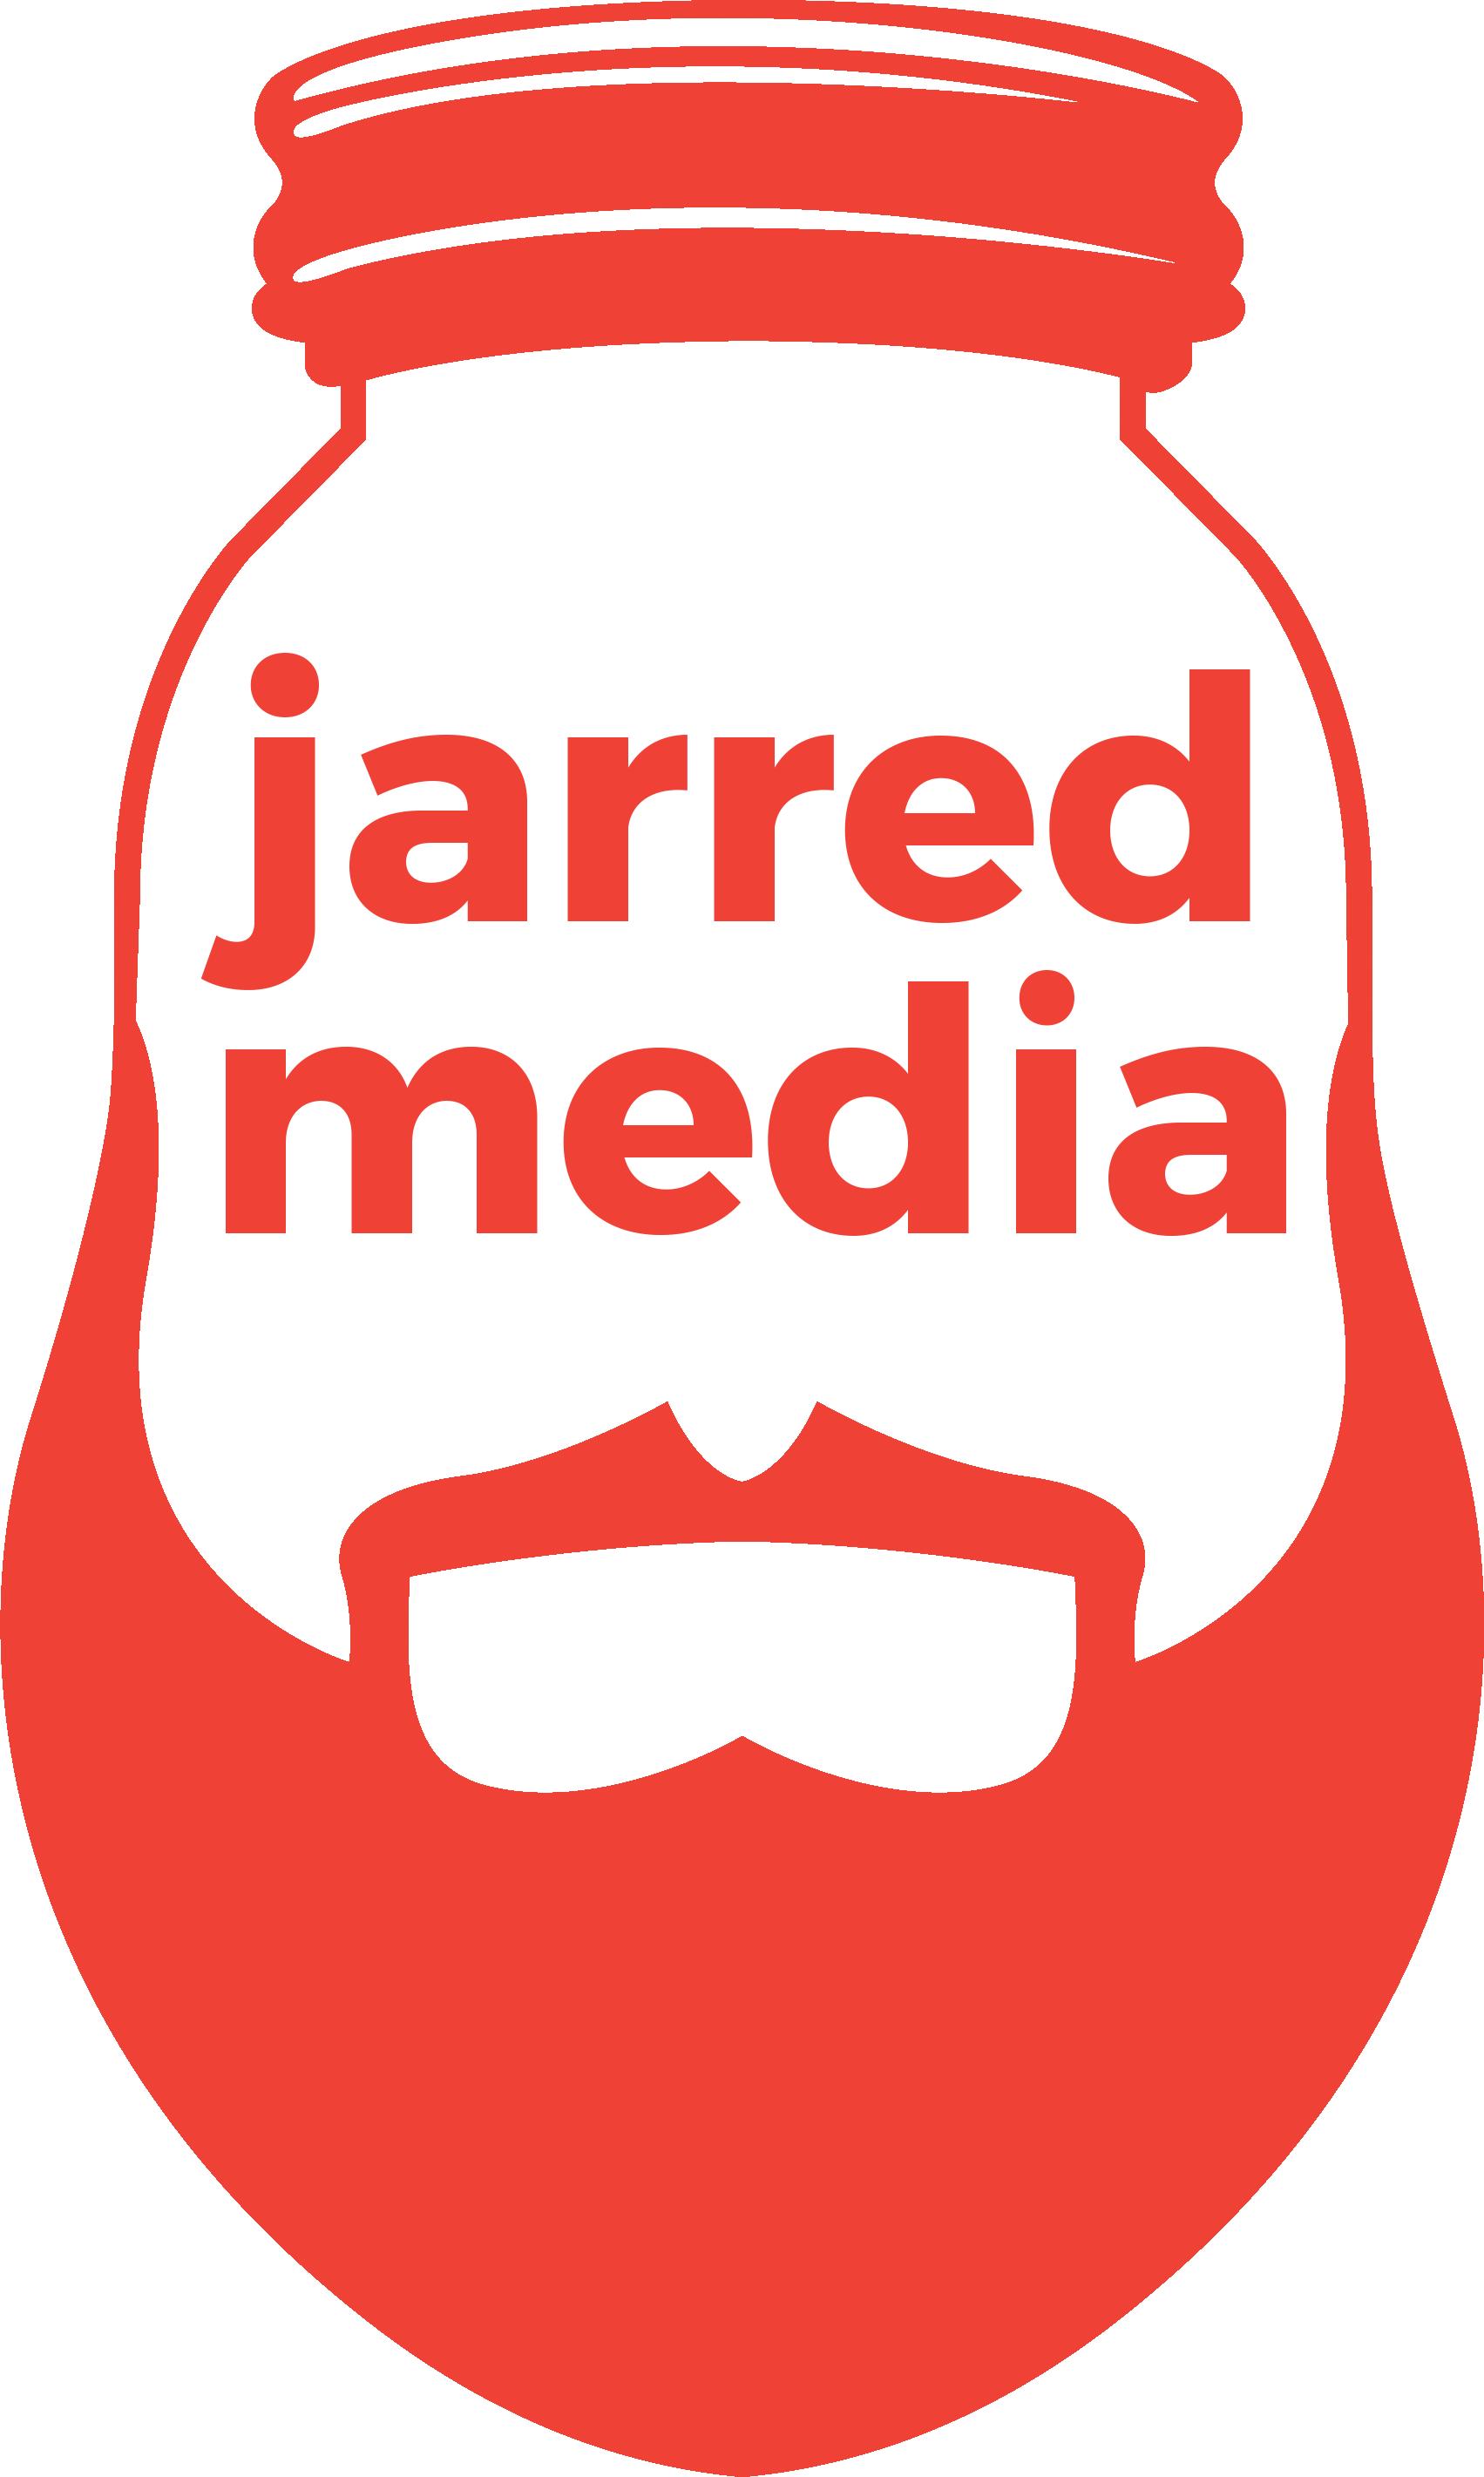 JM-logo-red_wihte-bg.png